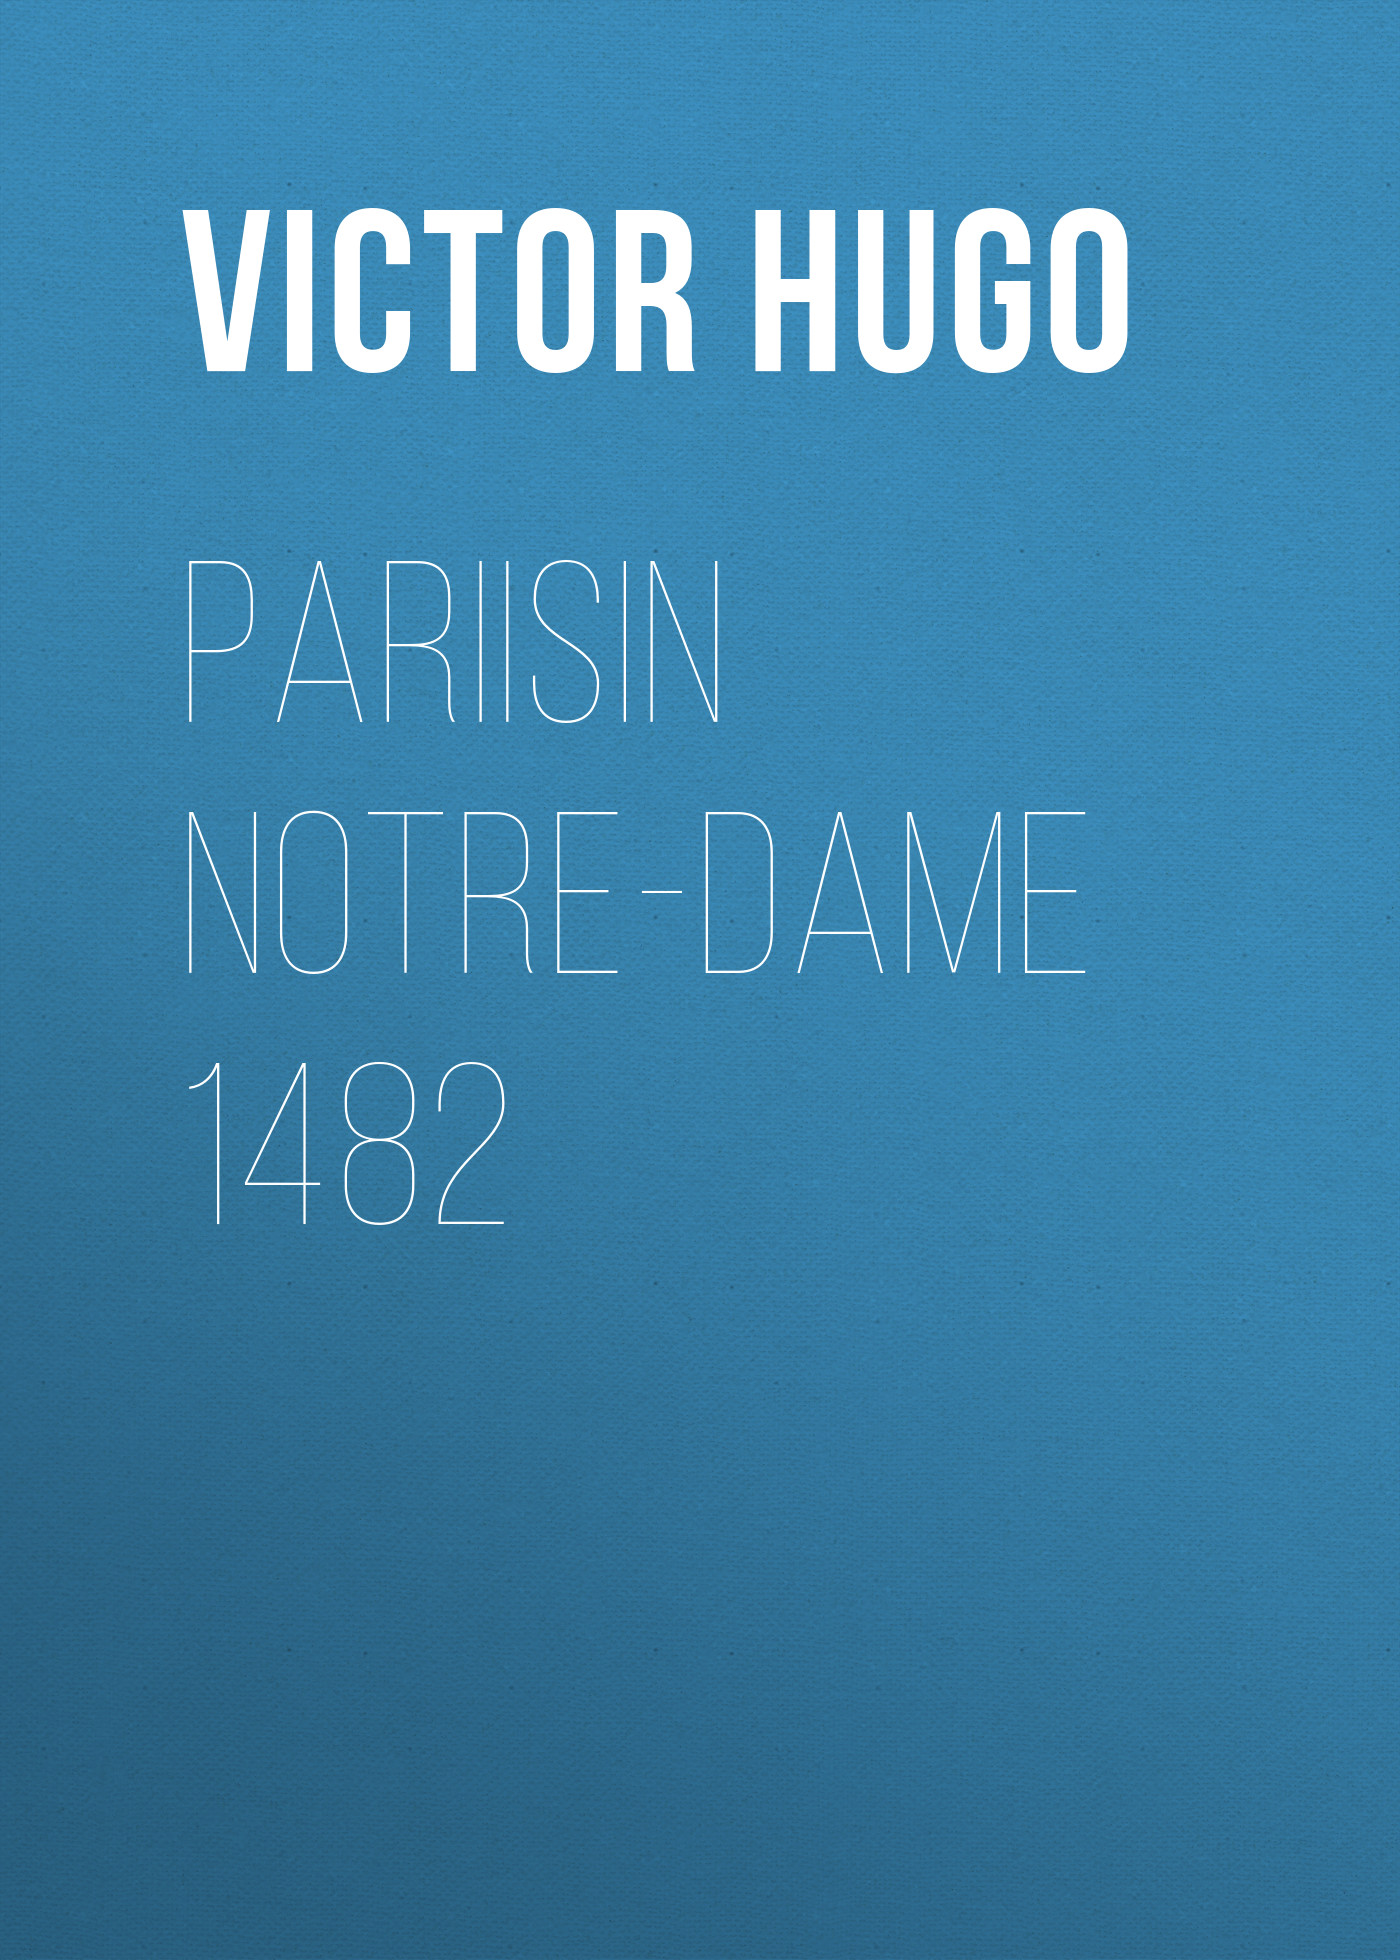 Виктор Мари Гюго Pariisin Notre-Dame 1482 hugo victor the hunchback of notre dame